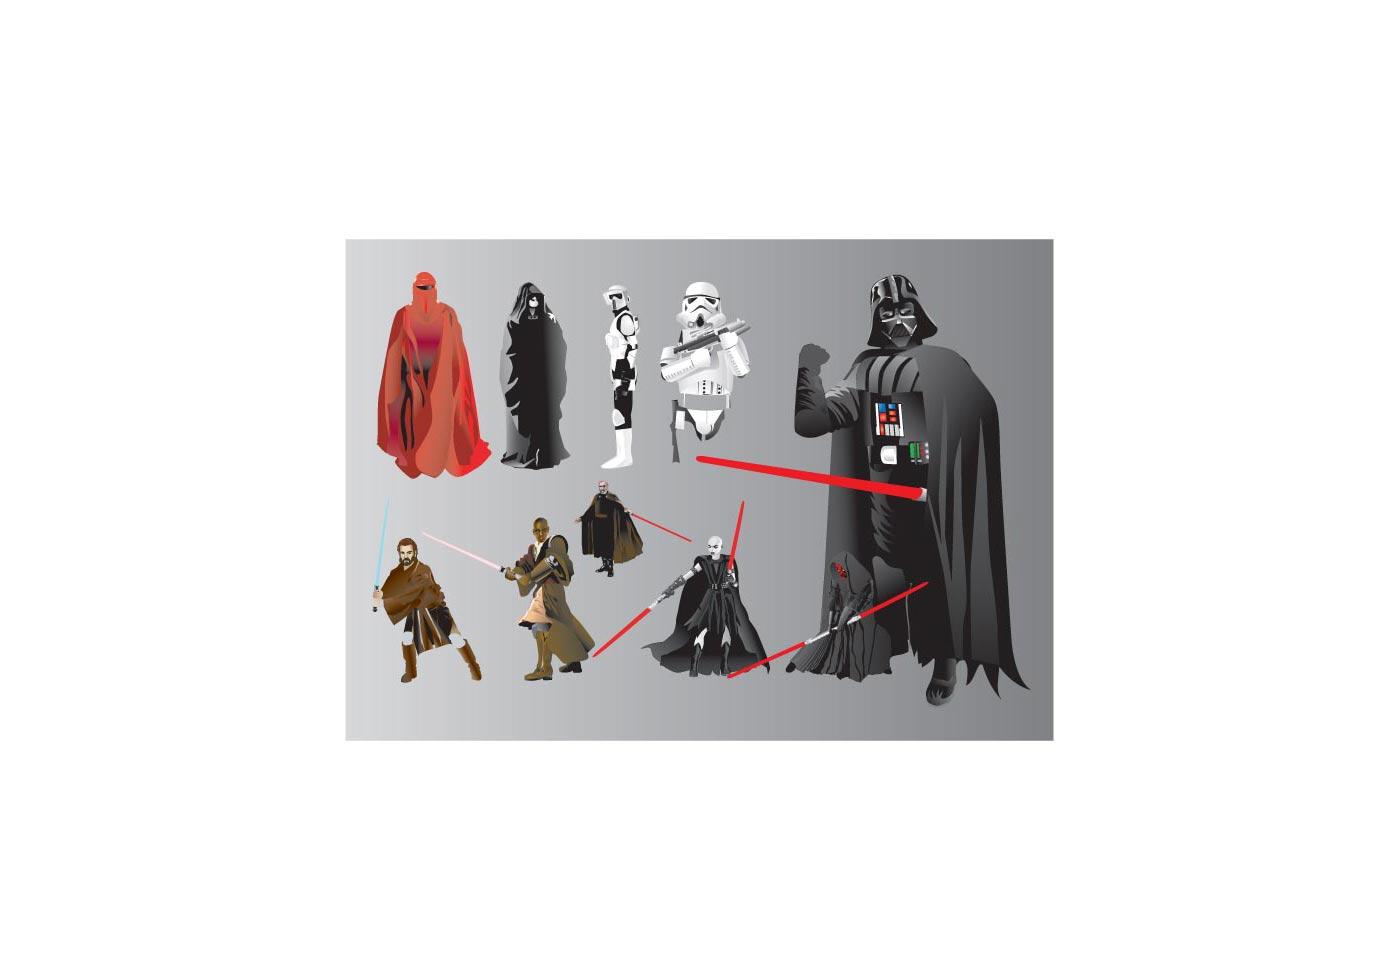 Star Wars Illustrations - Download Free Vector Art, Stock ...